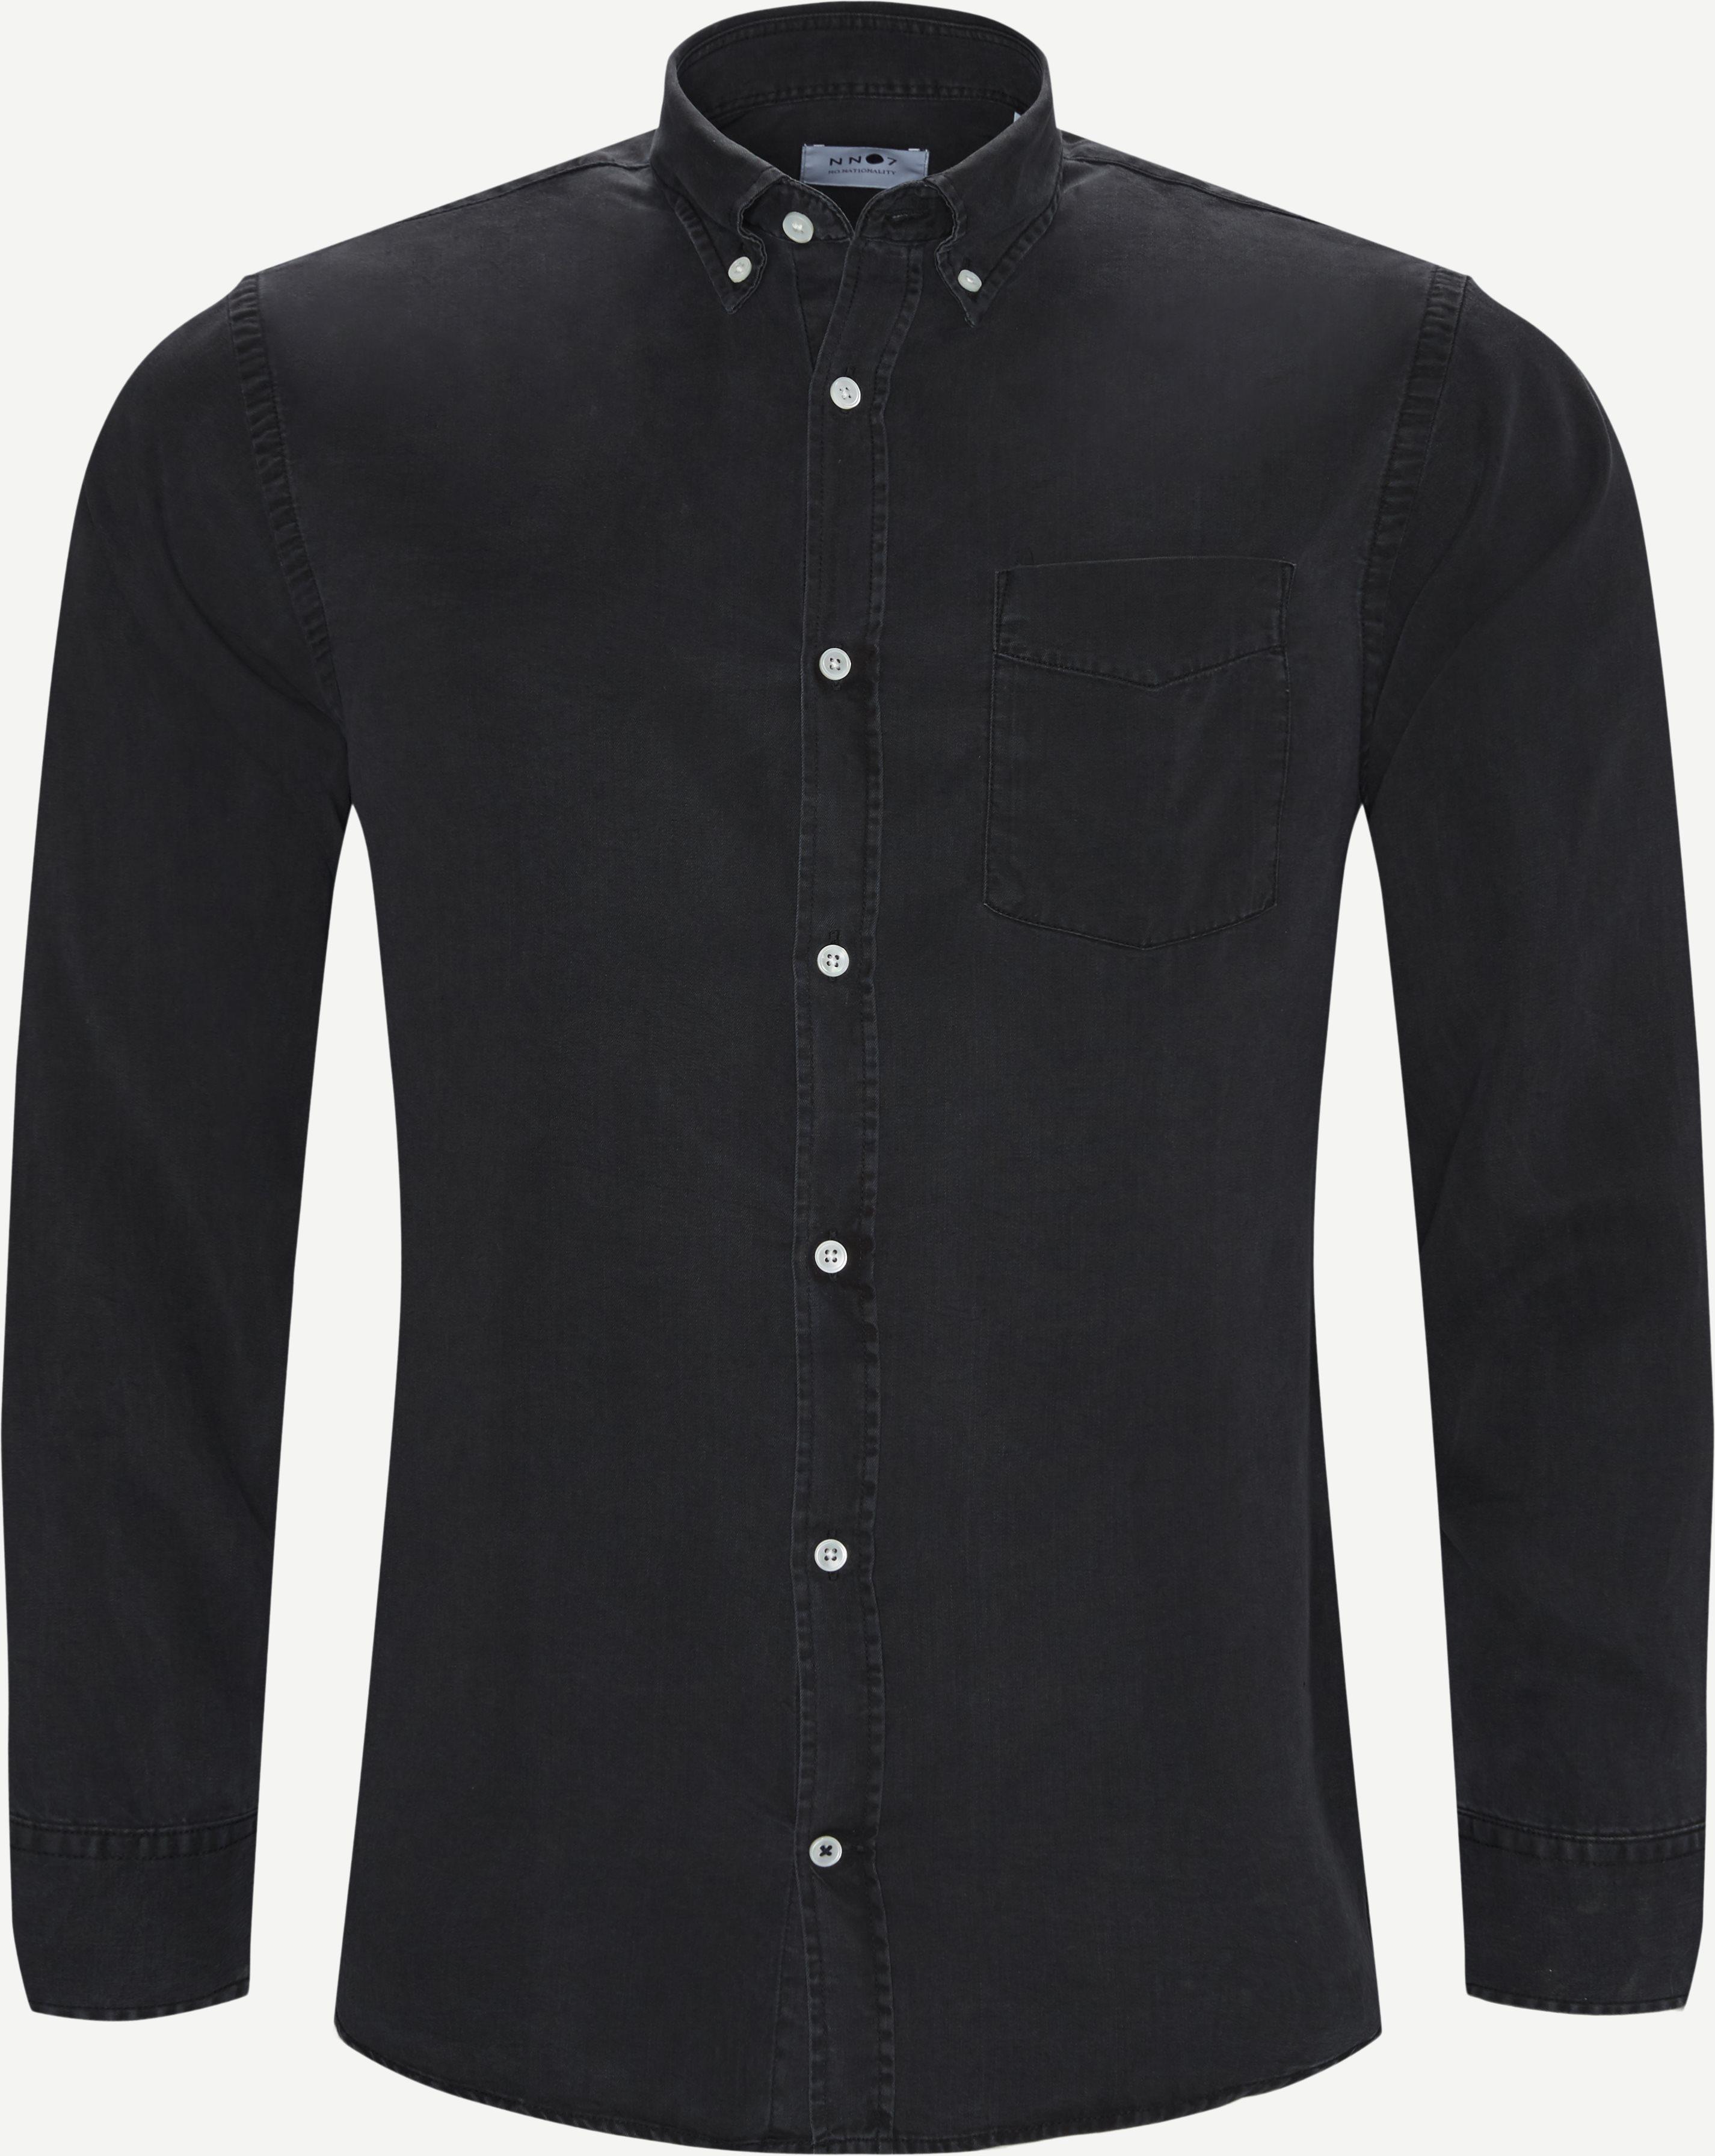 Shirts - Regular fit - Black